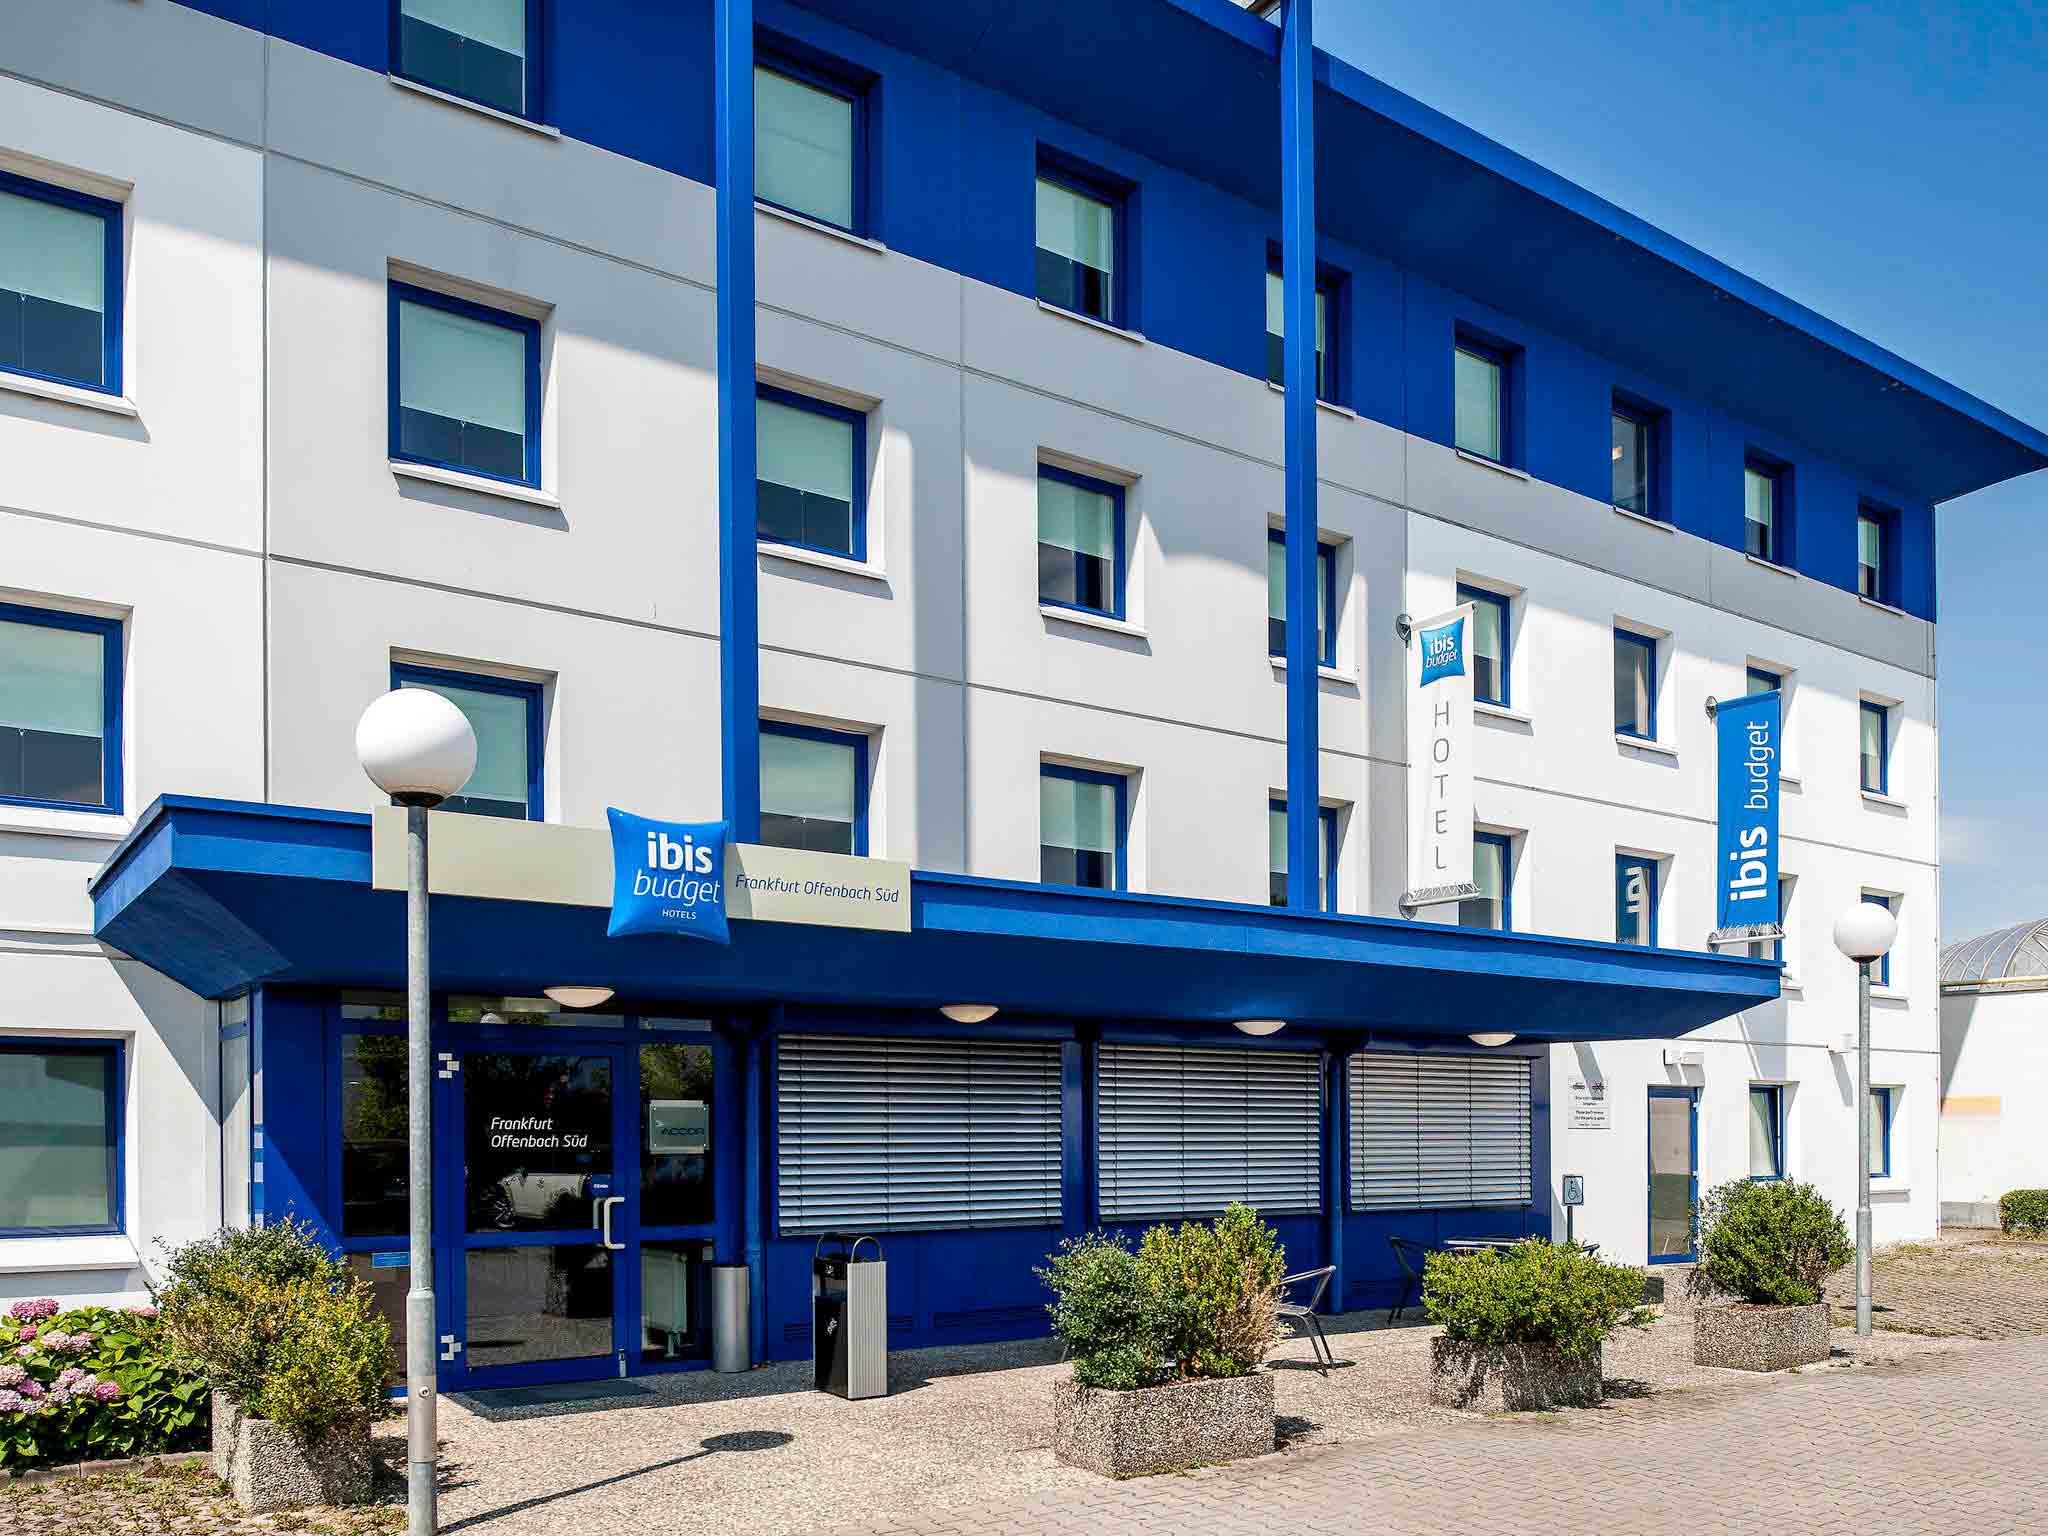 Hotel Ibis Budget Frankfurt Offenbach Sued